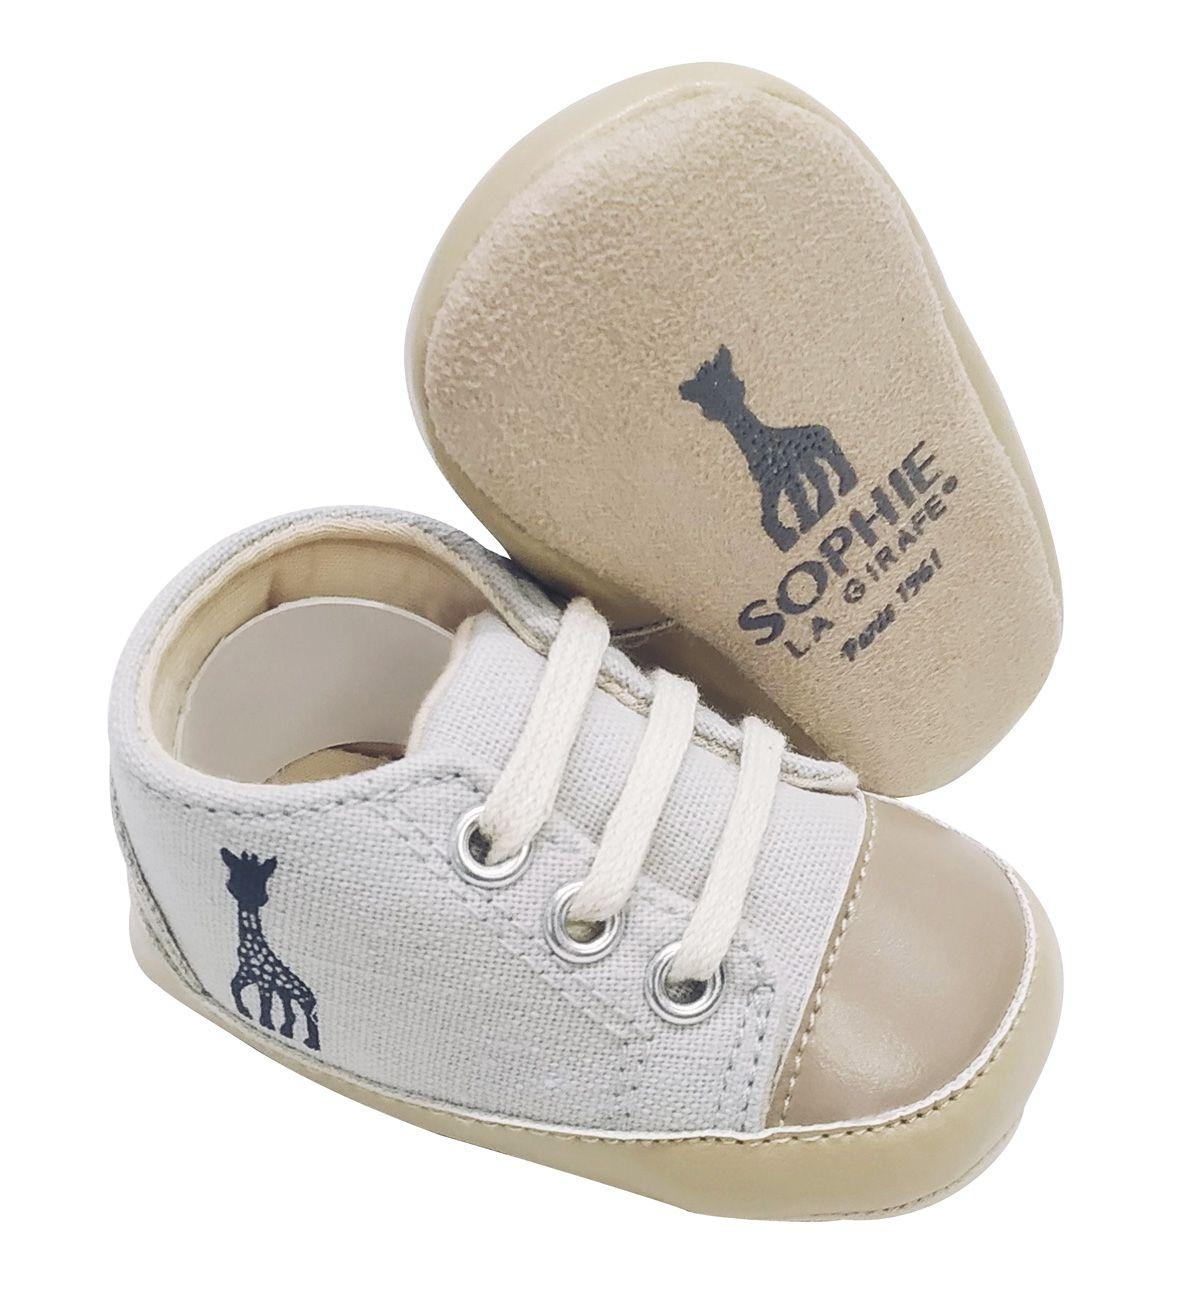 Sapato Basket Bege - Sophie La Girafe